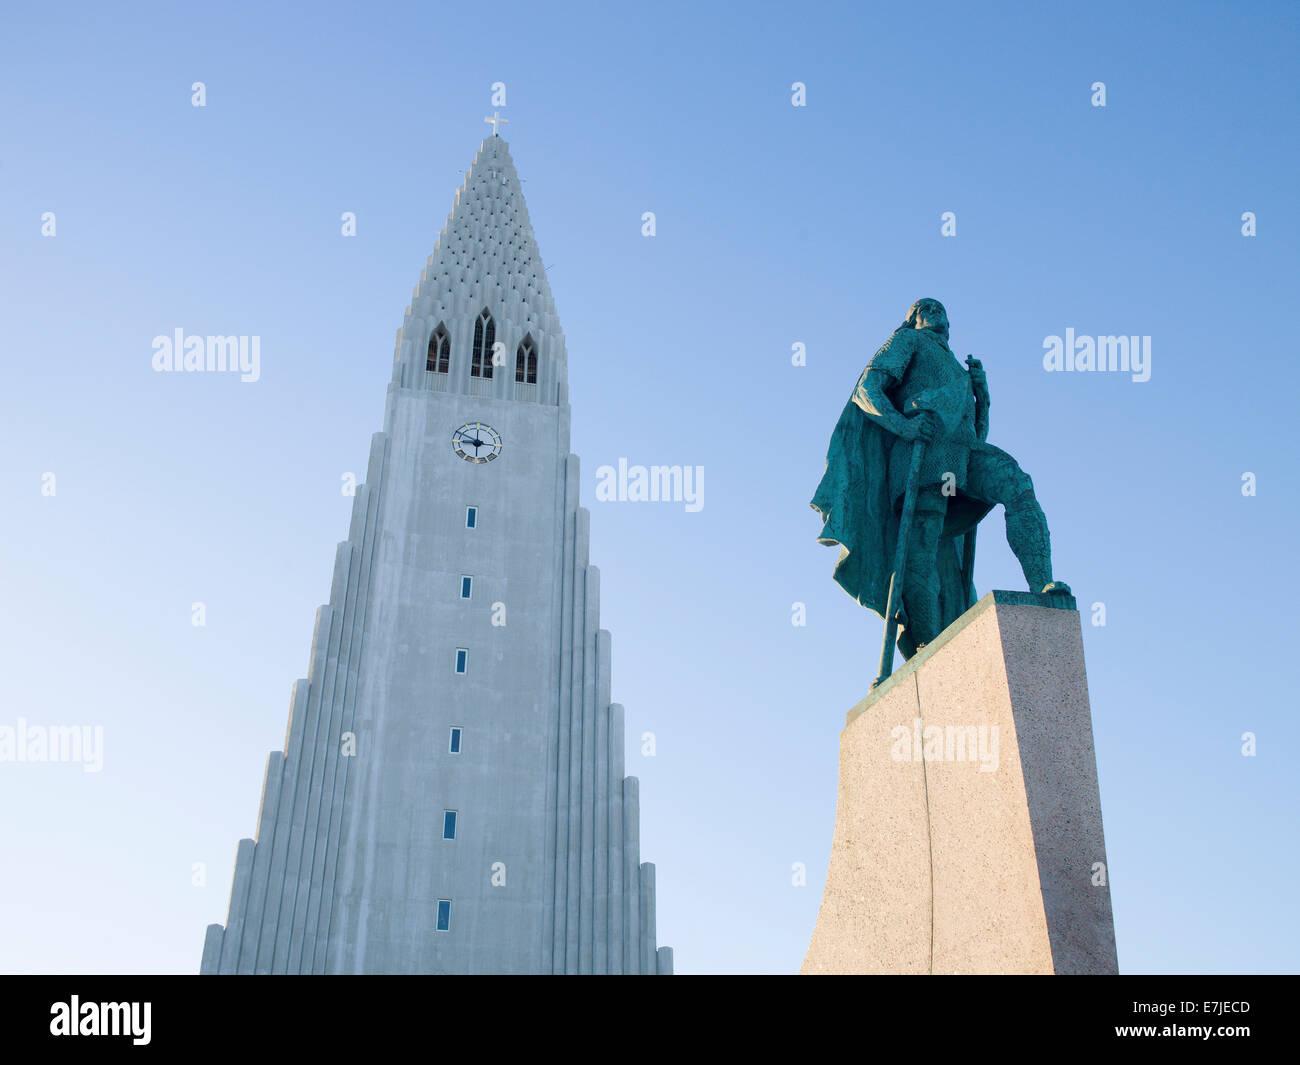 Denkmal, Entdecker, Forscher, Hallkrim, Capital, Insel, Island, Europa, Kirche, Nordeuropa, Reykjavik, Seemann, Stockbild